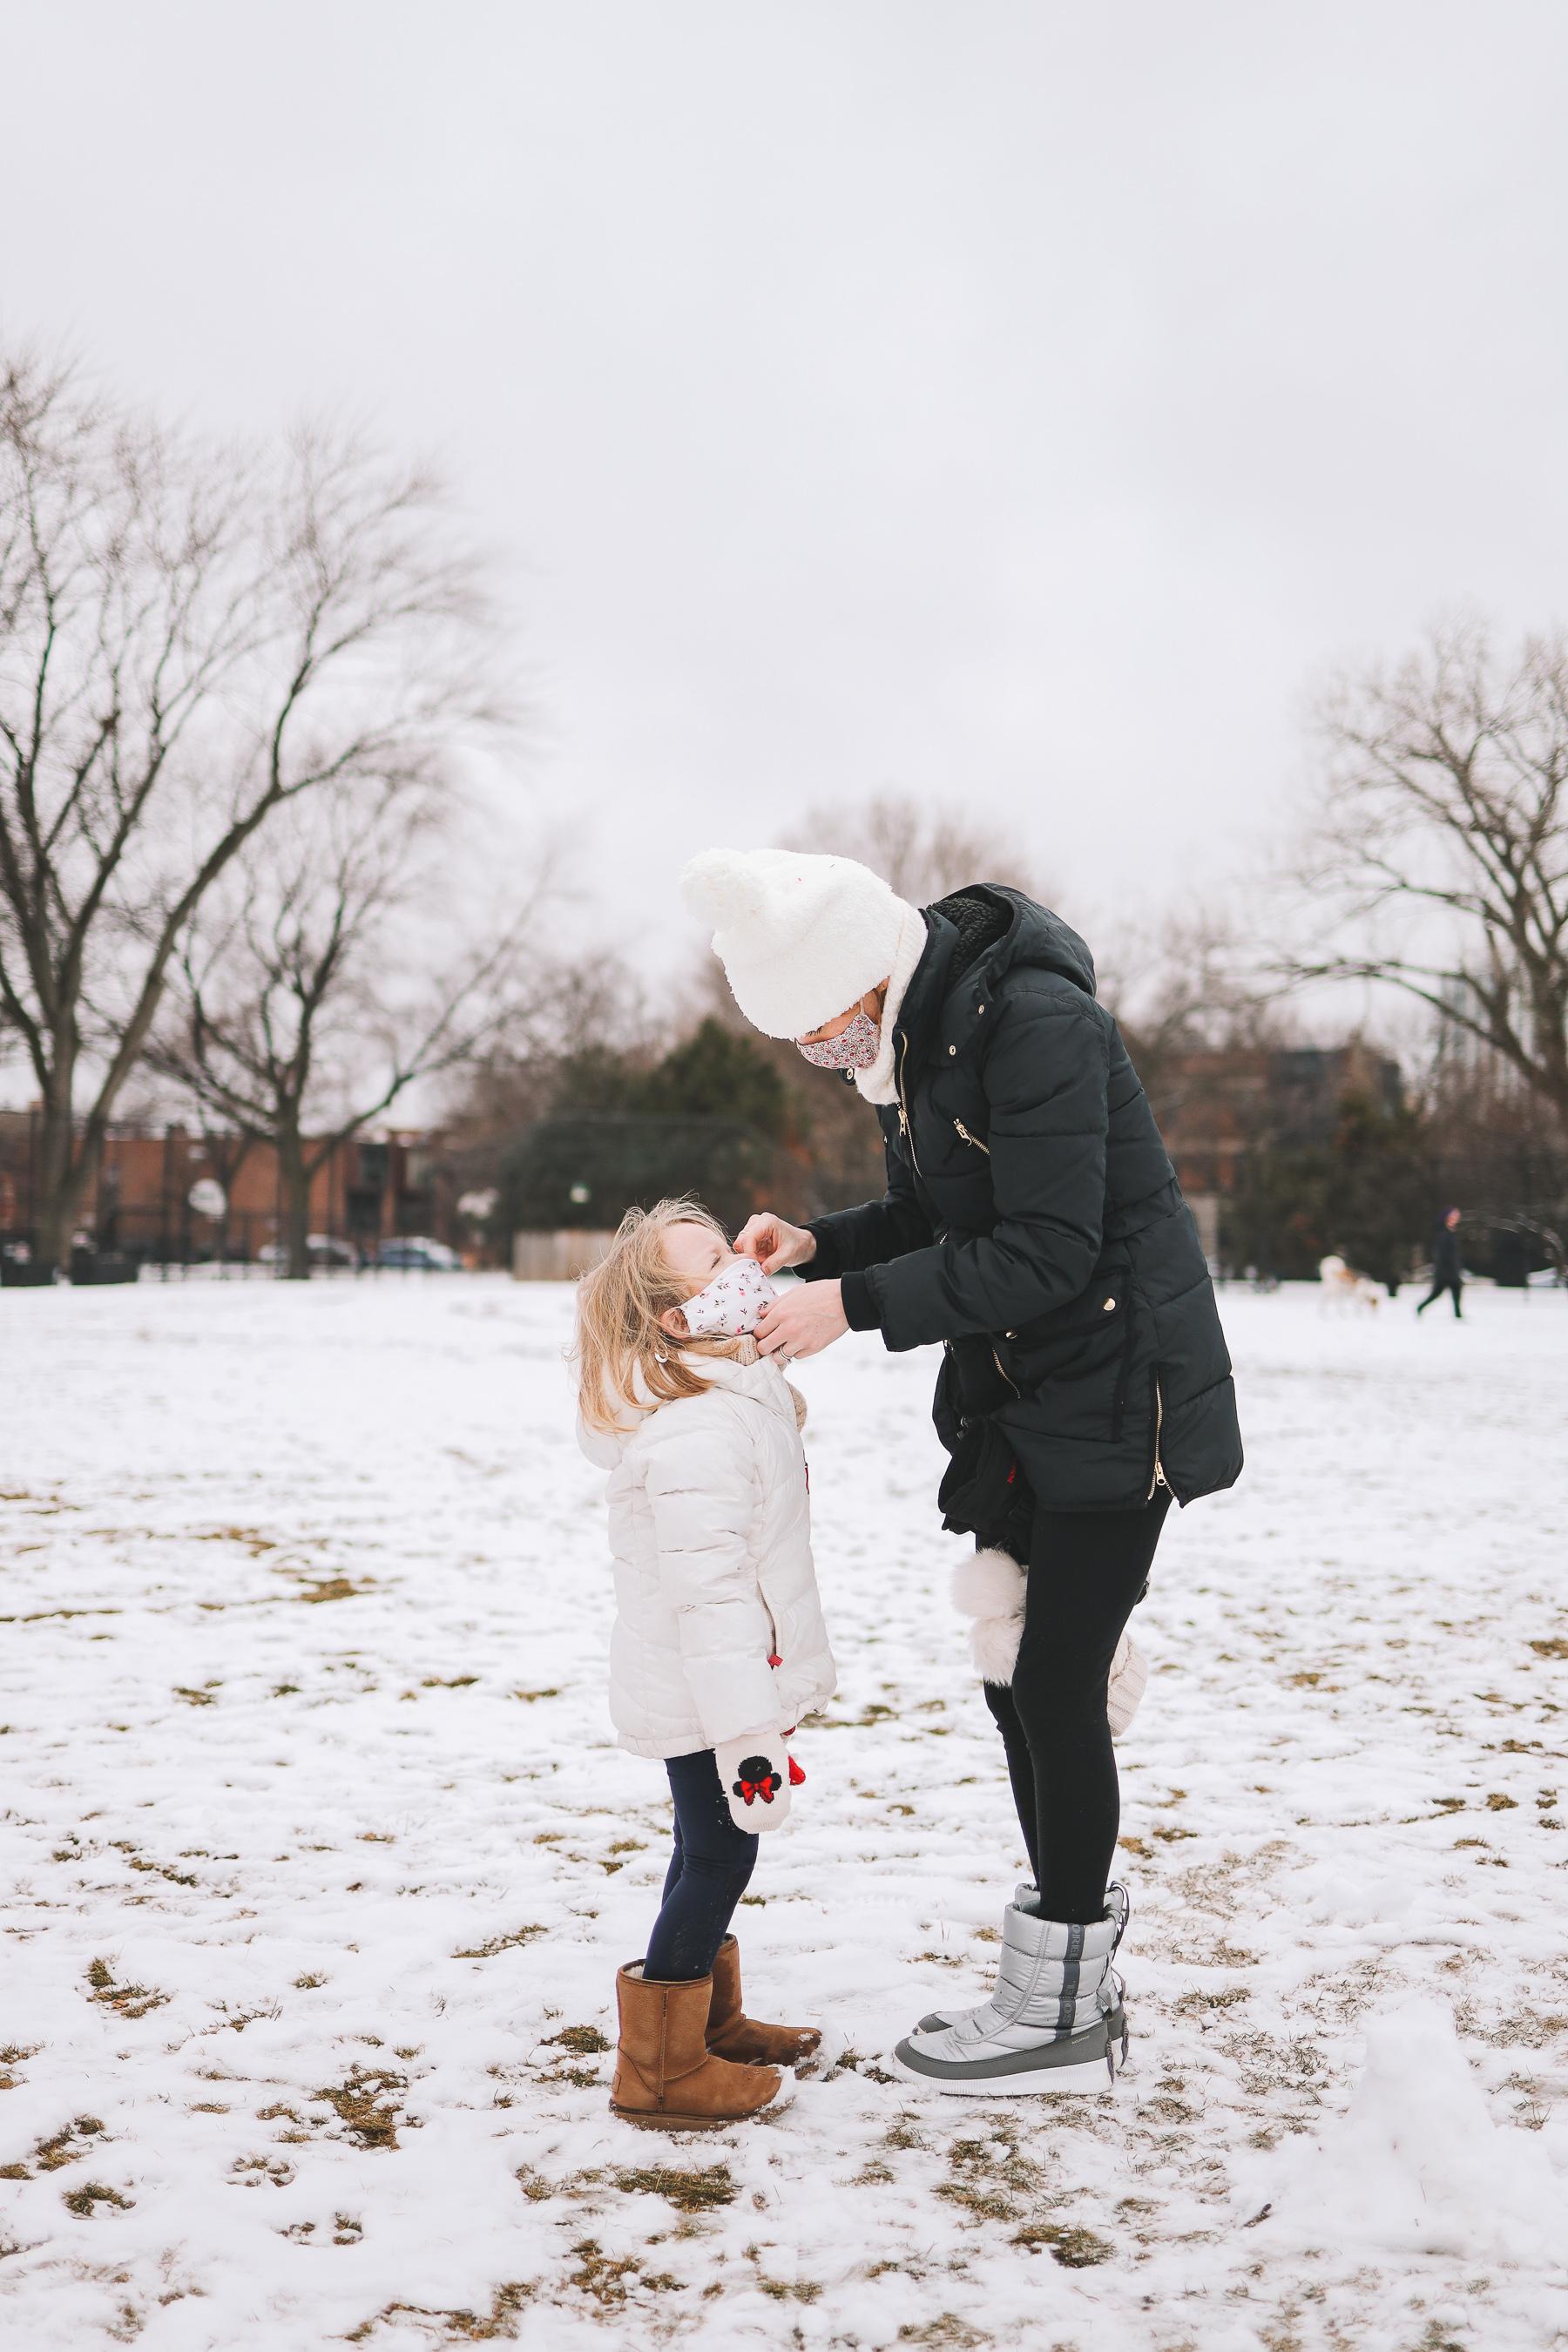 Oz Park Snow Day with kids